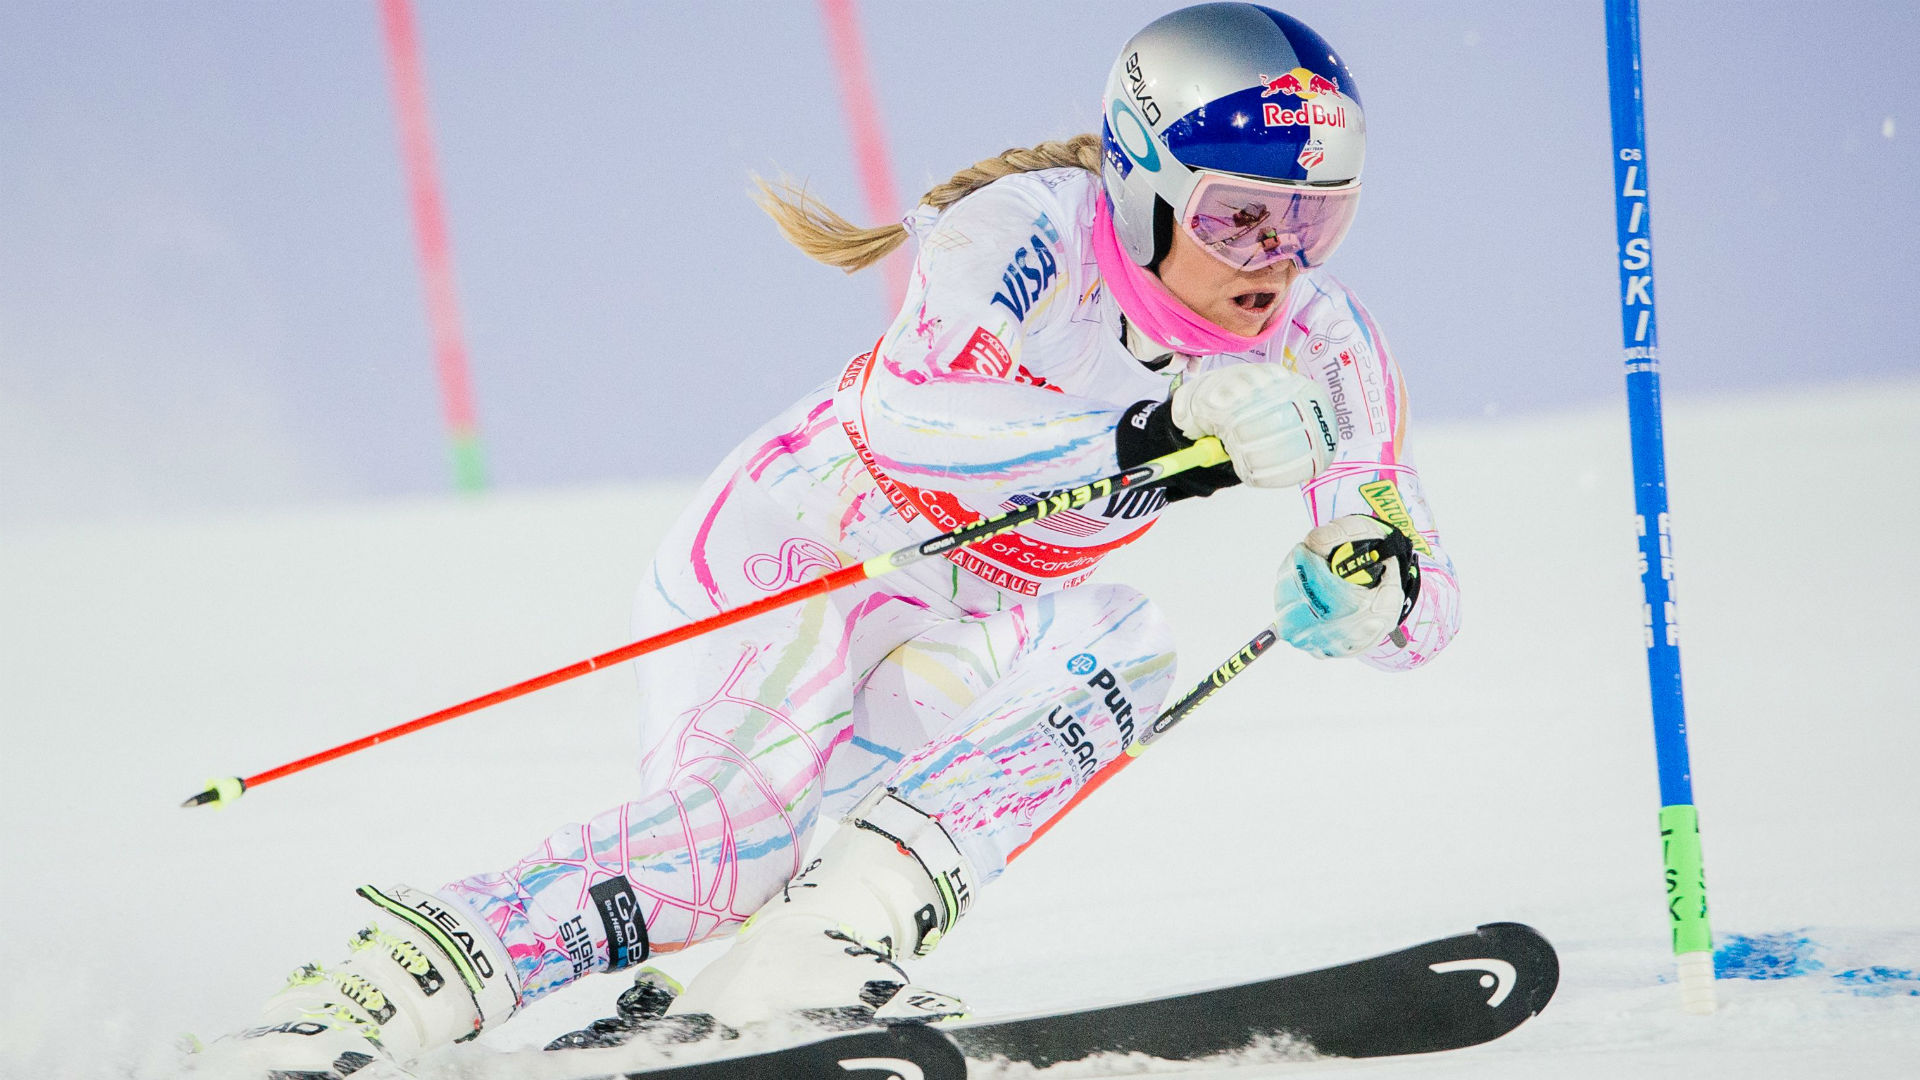 Lindsey Vonn Skiing Wallpaper